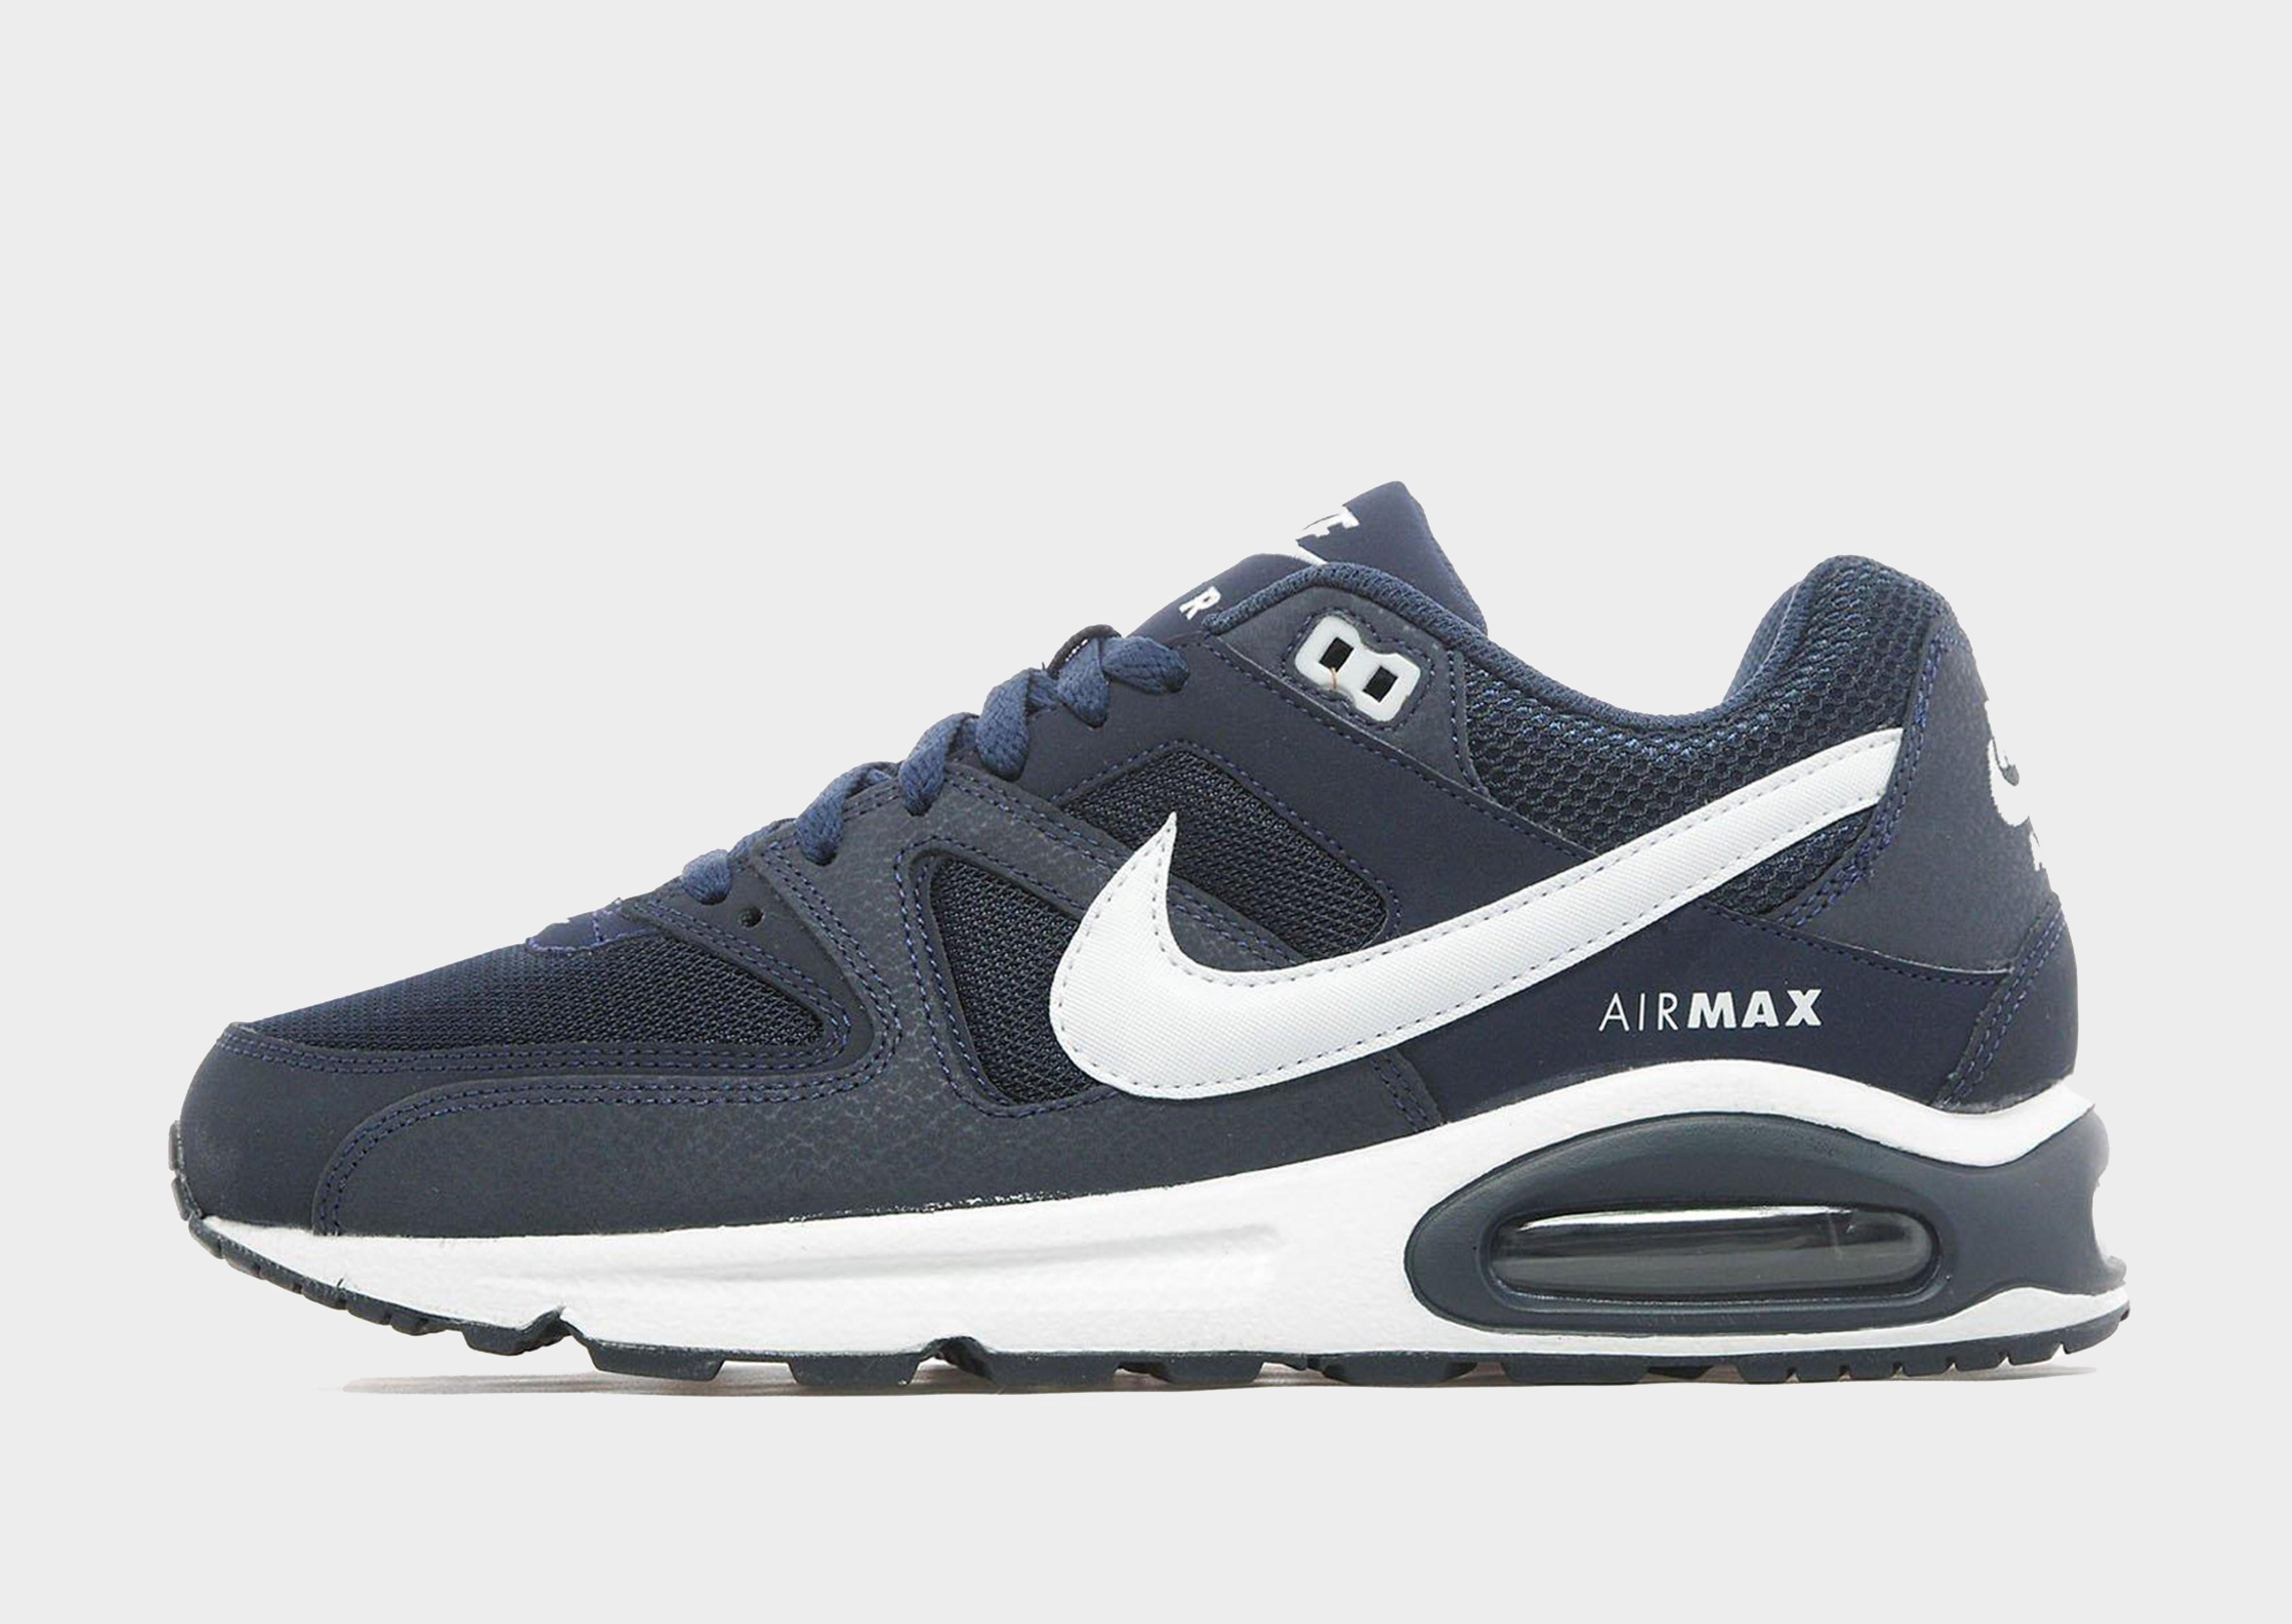 Nike Air Max Command herensneaker blauw